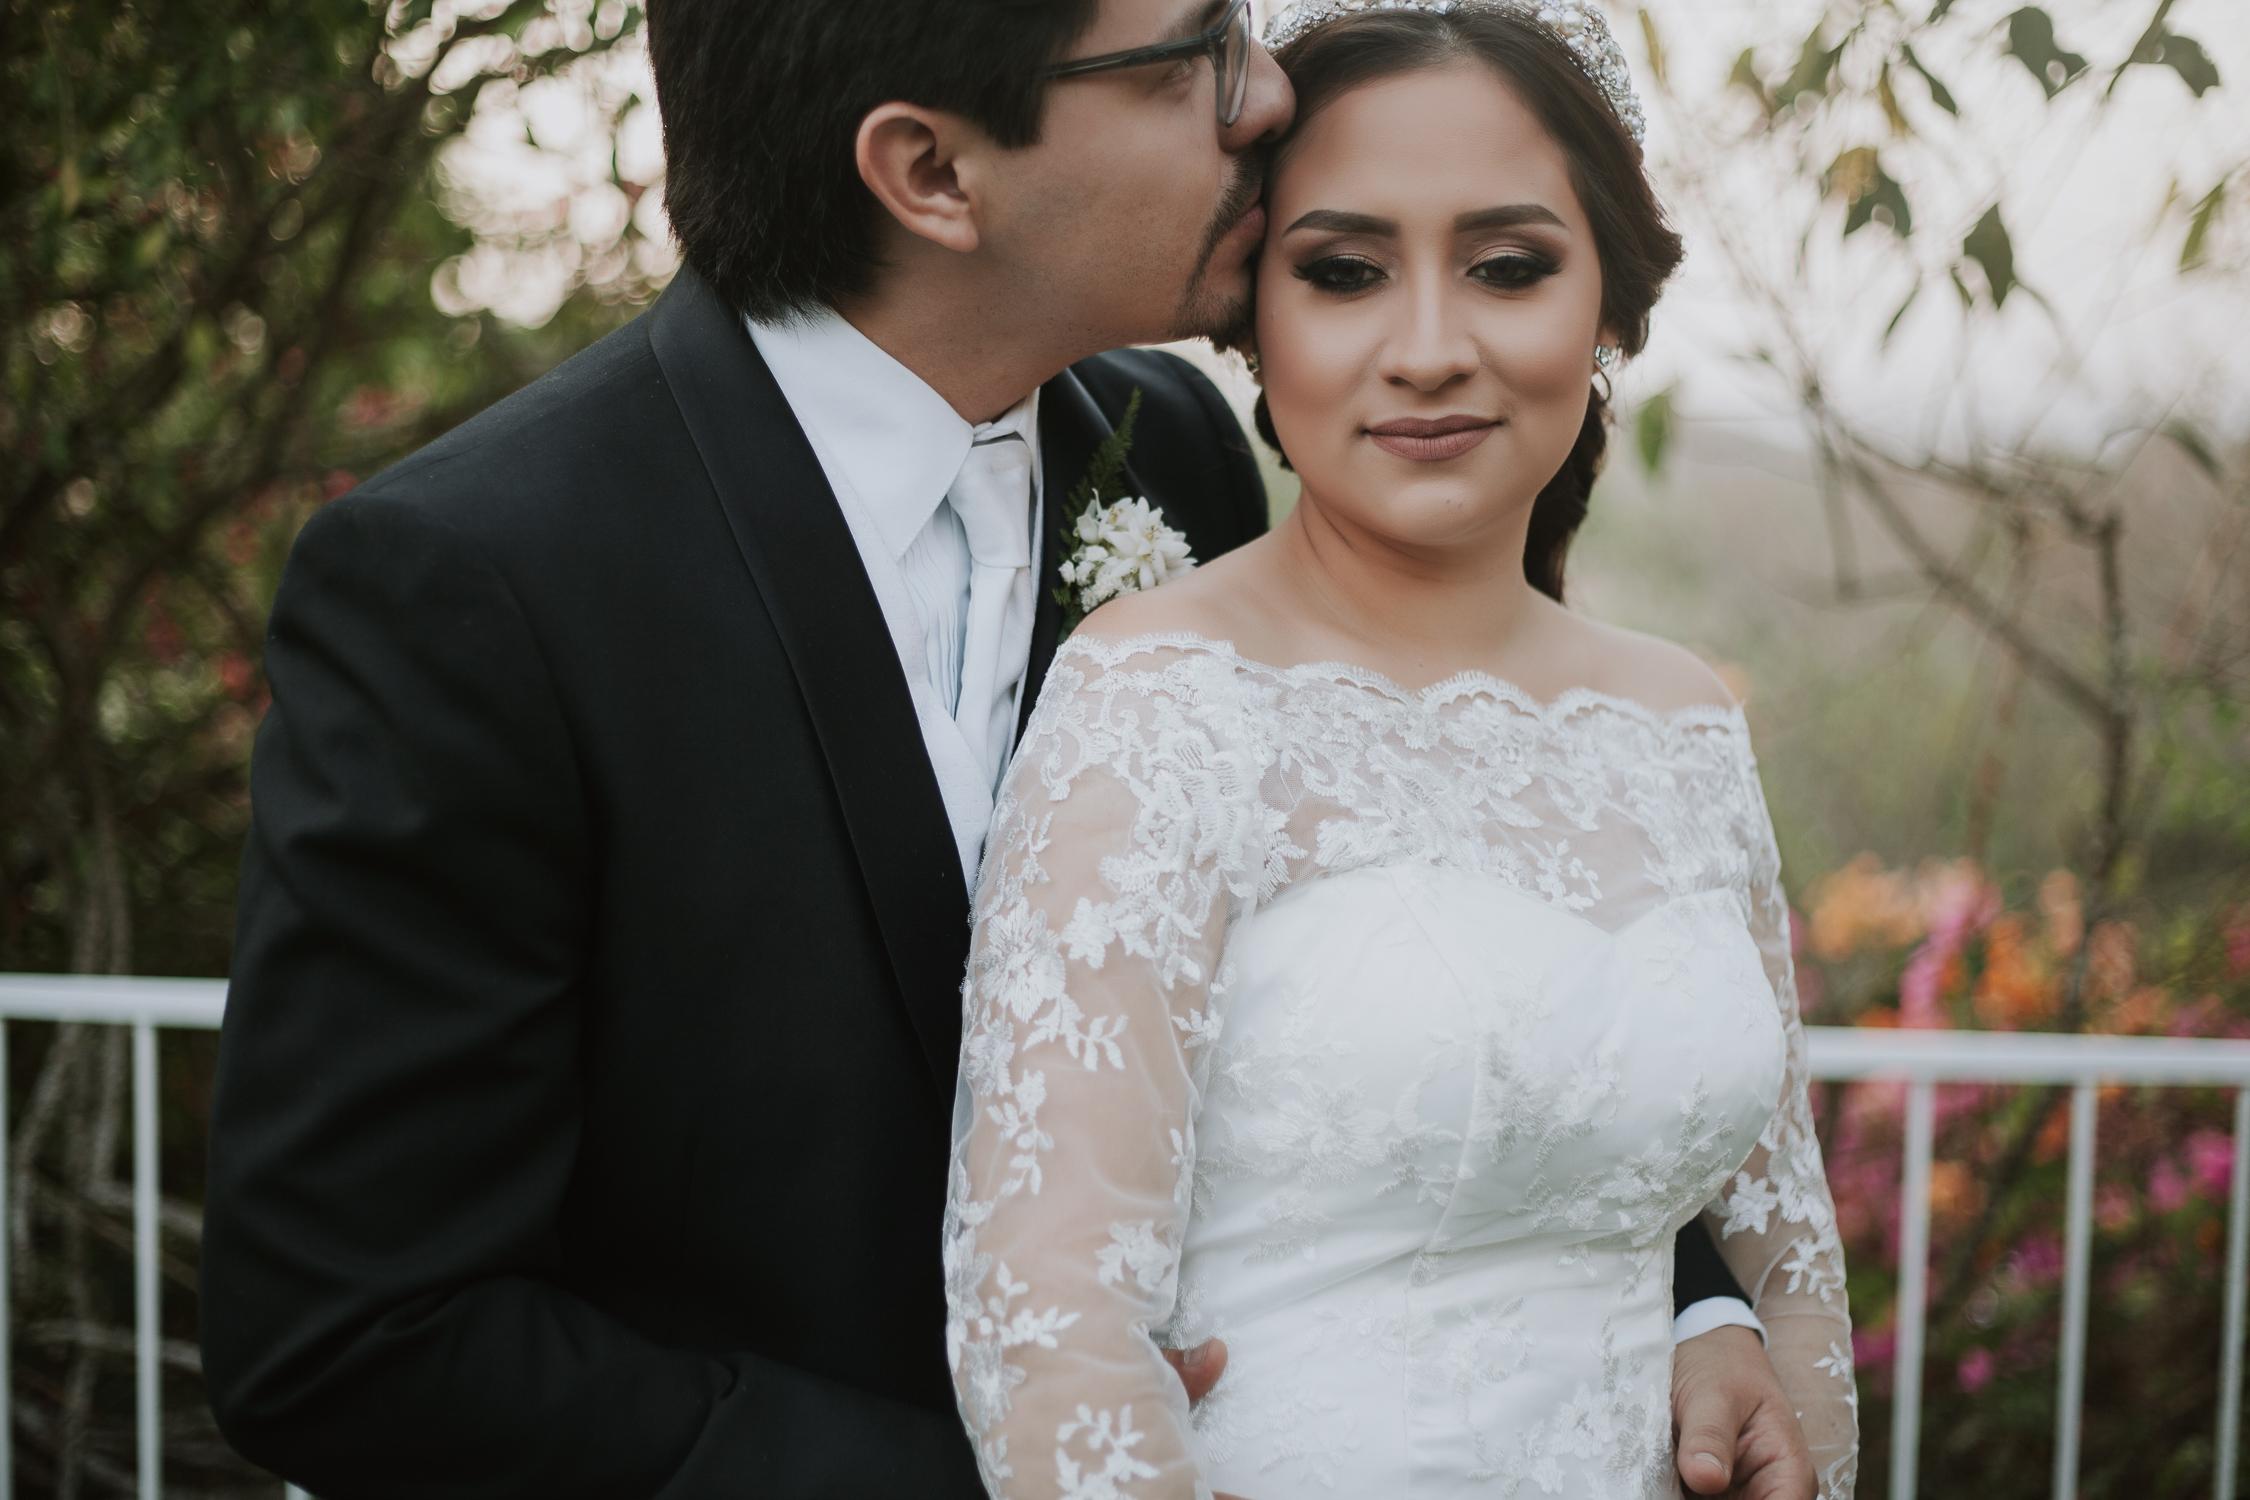 Michelle-Agurto-Fotografia-Bodas-Ecuador-Destination-Wedding-Photographer-Pauli-Edwin-19.JPG